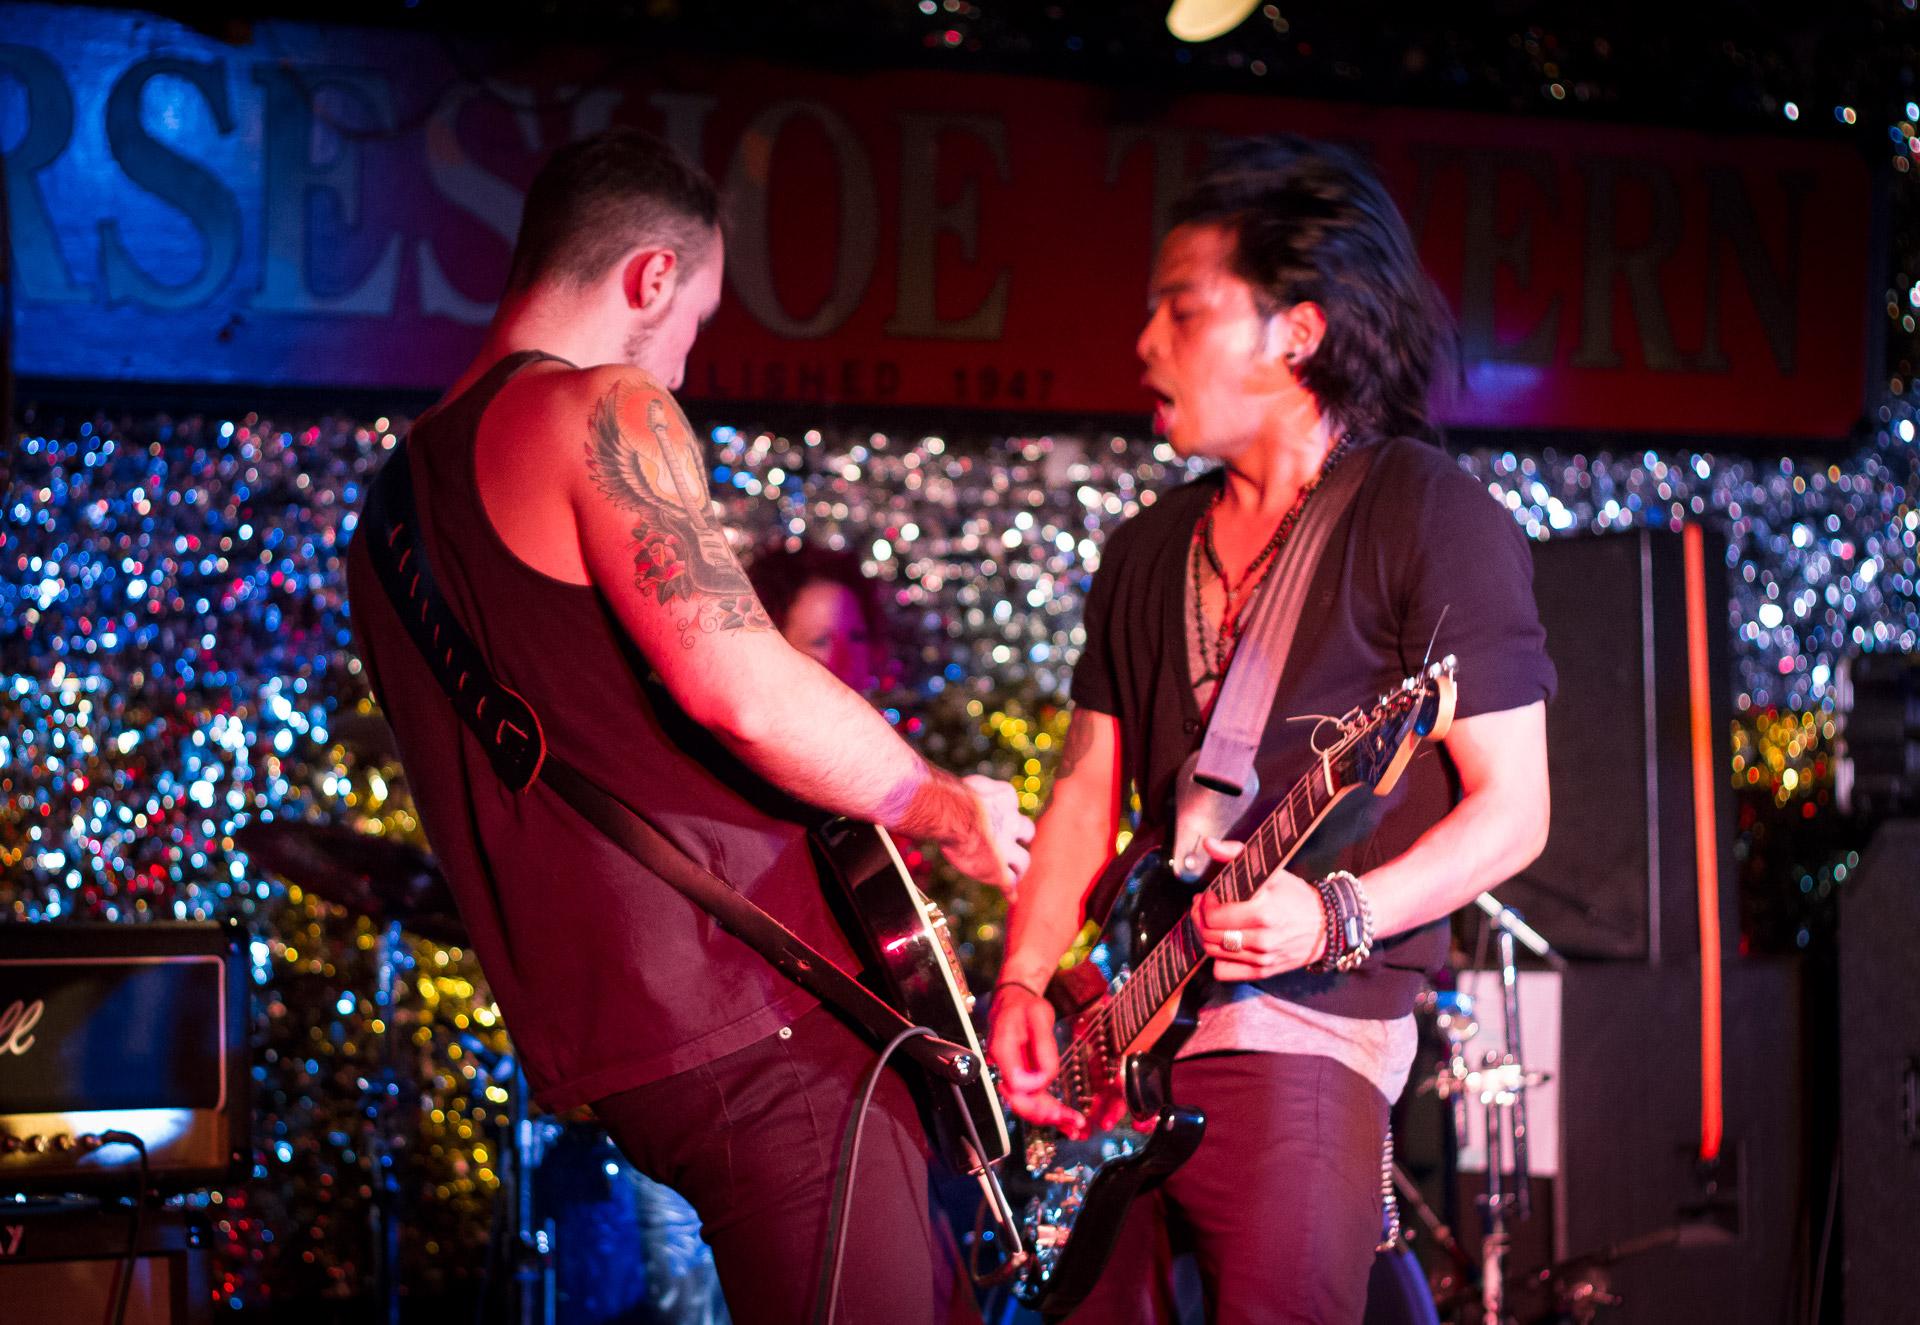 Andrew Moniz and Jakey Franco of Jackstay